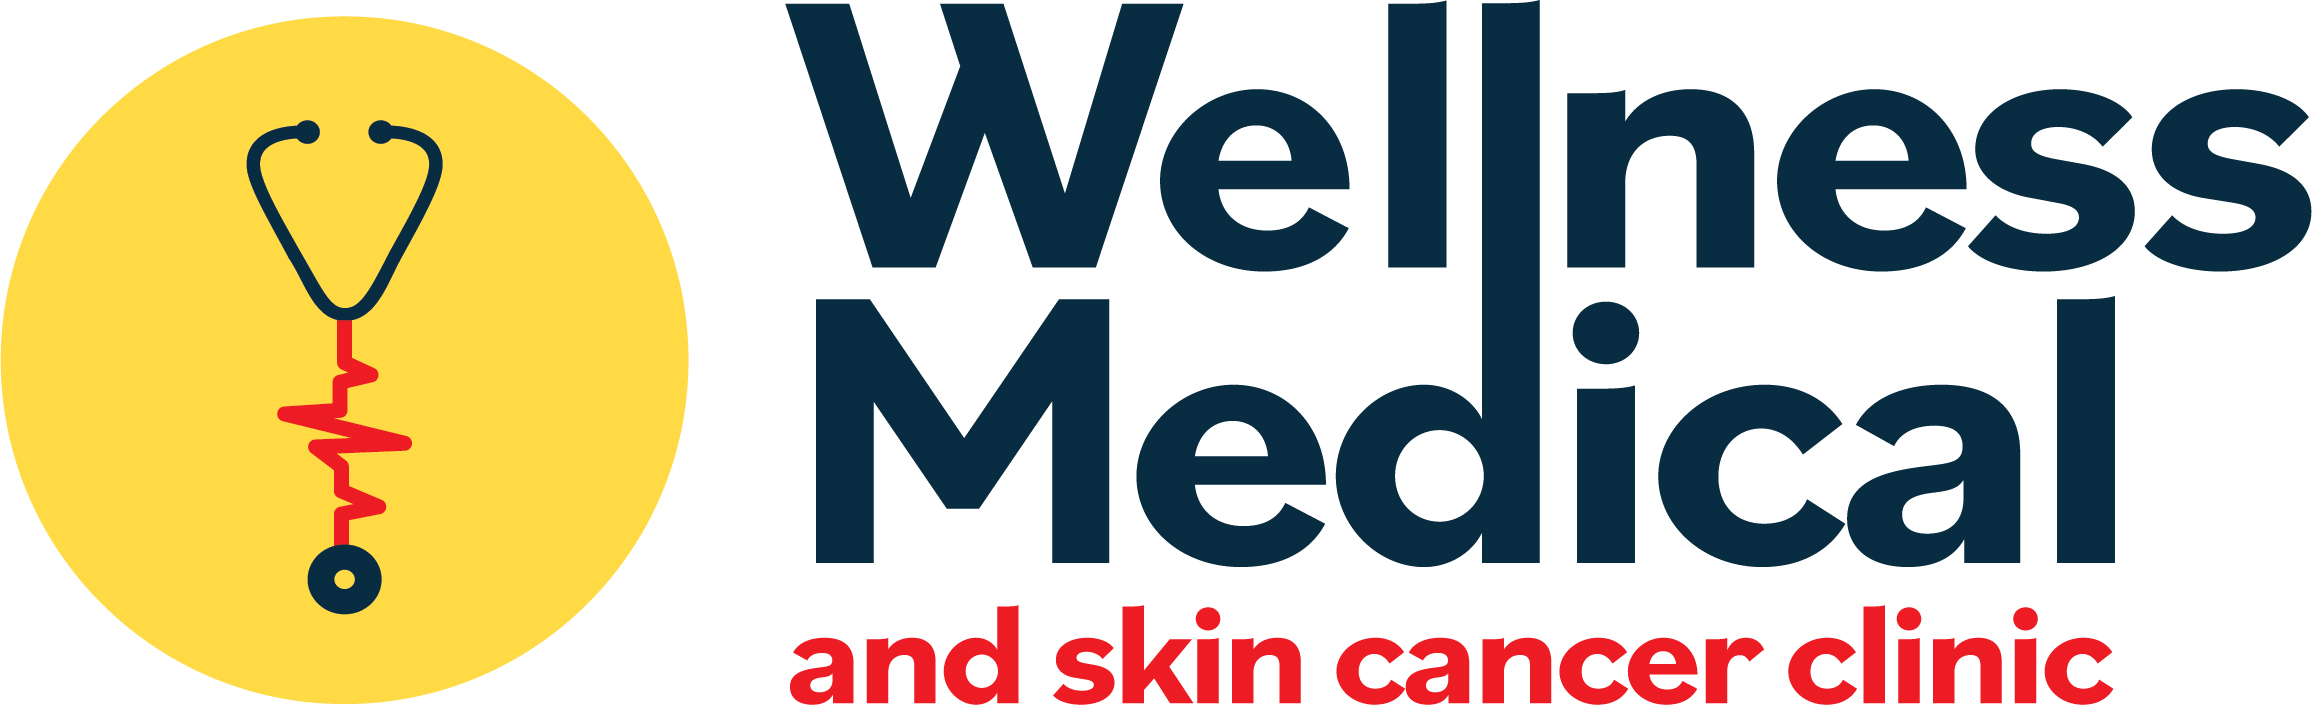 Wellness Medical and Skin Cancer Clinic Logo